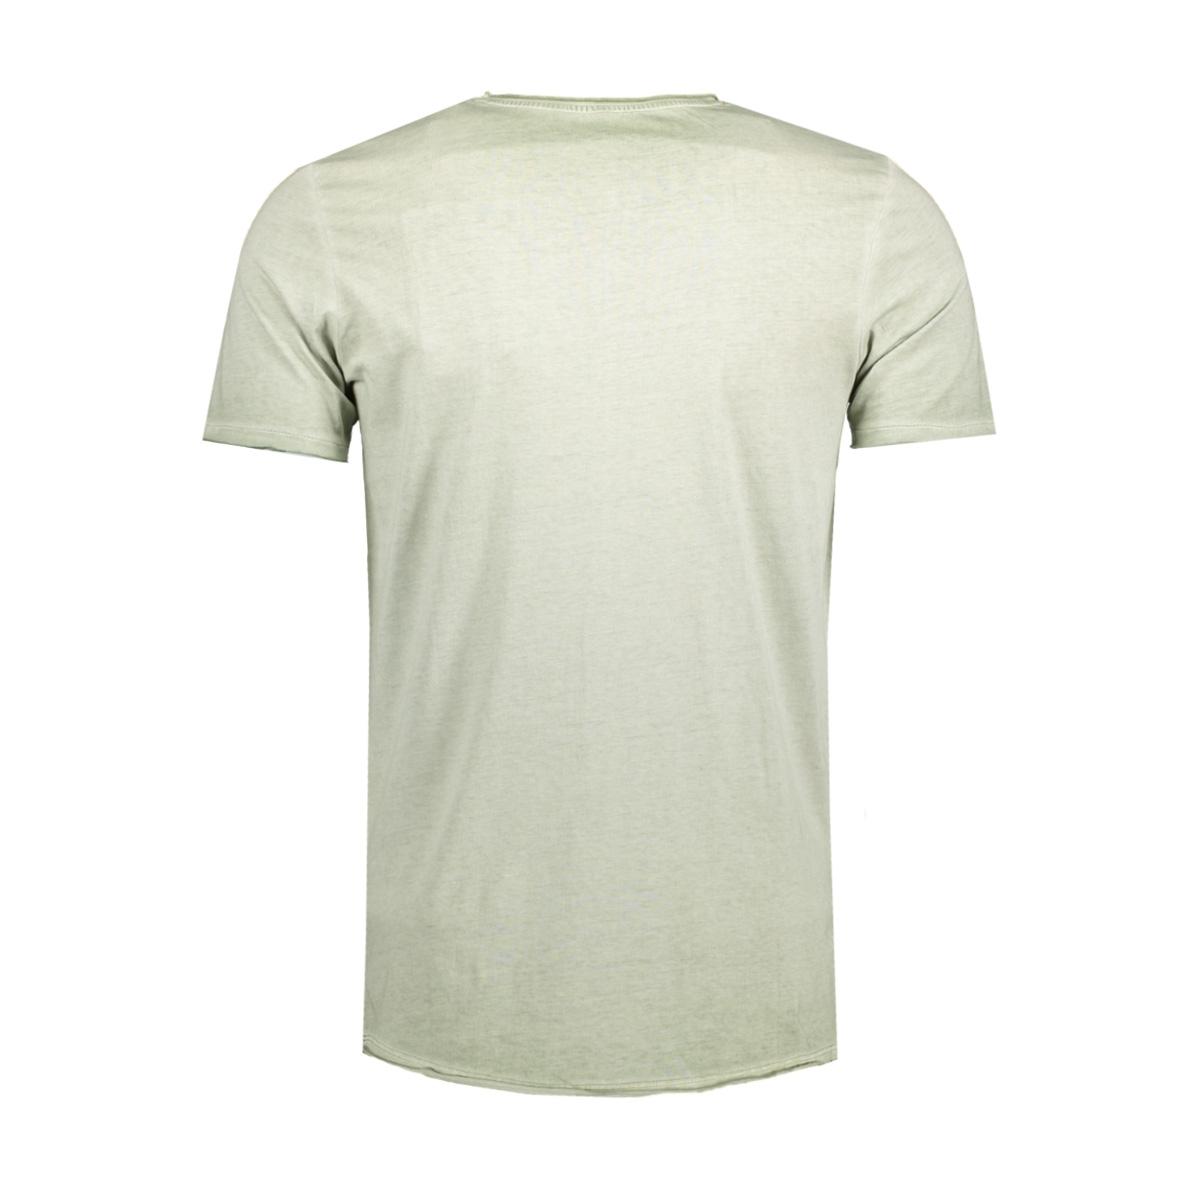 jjvjack ss tee crew neck noos 12103171 jack & jones t-shirt seagrass